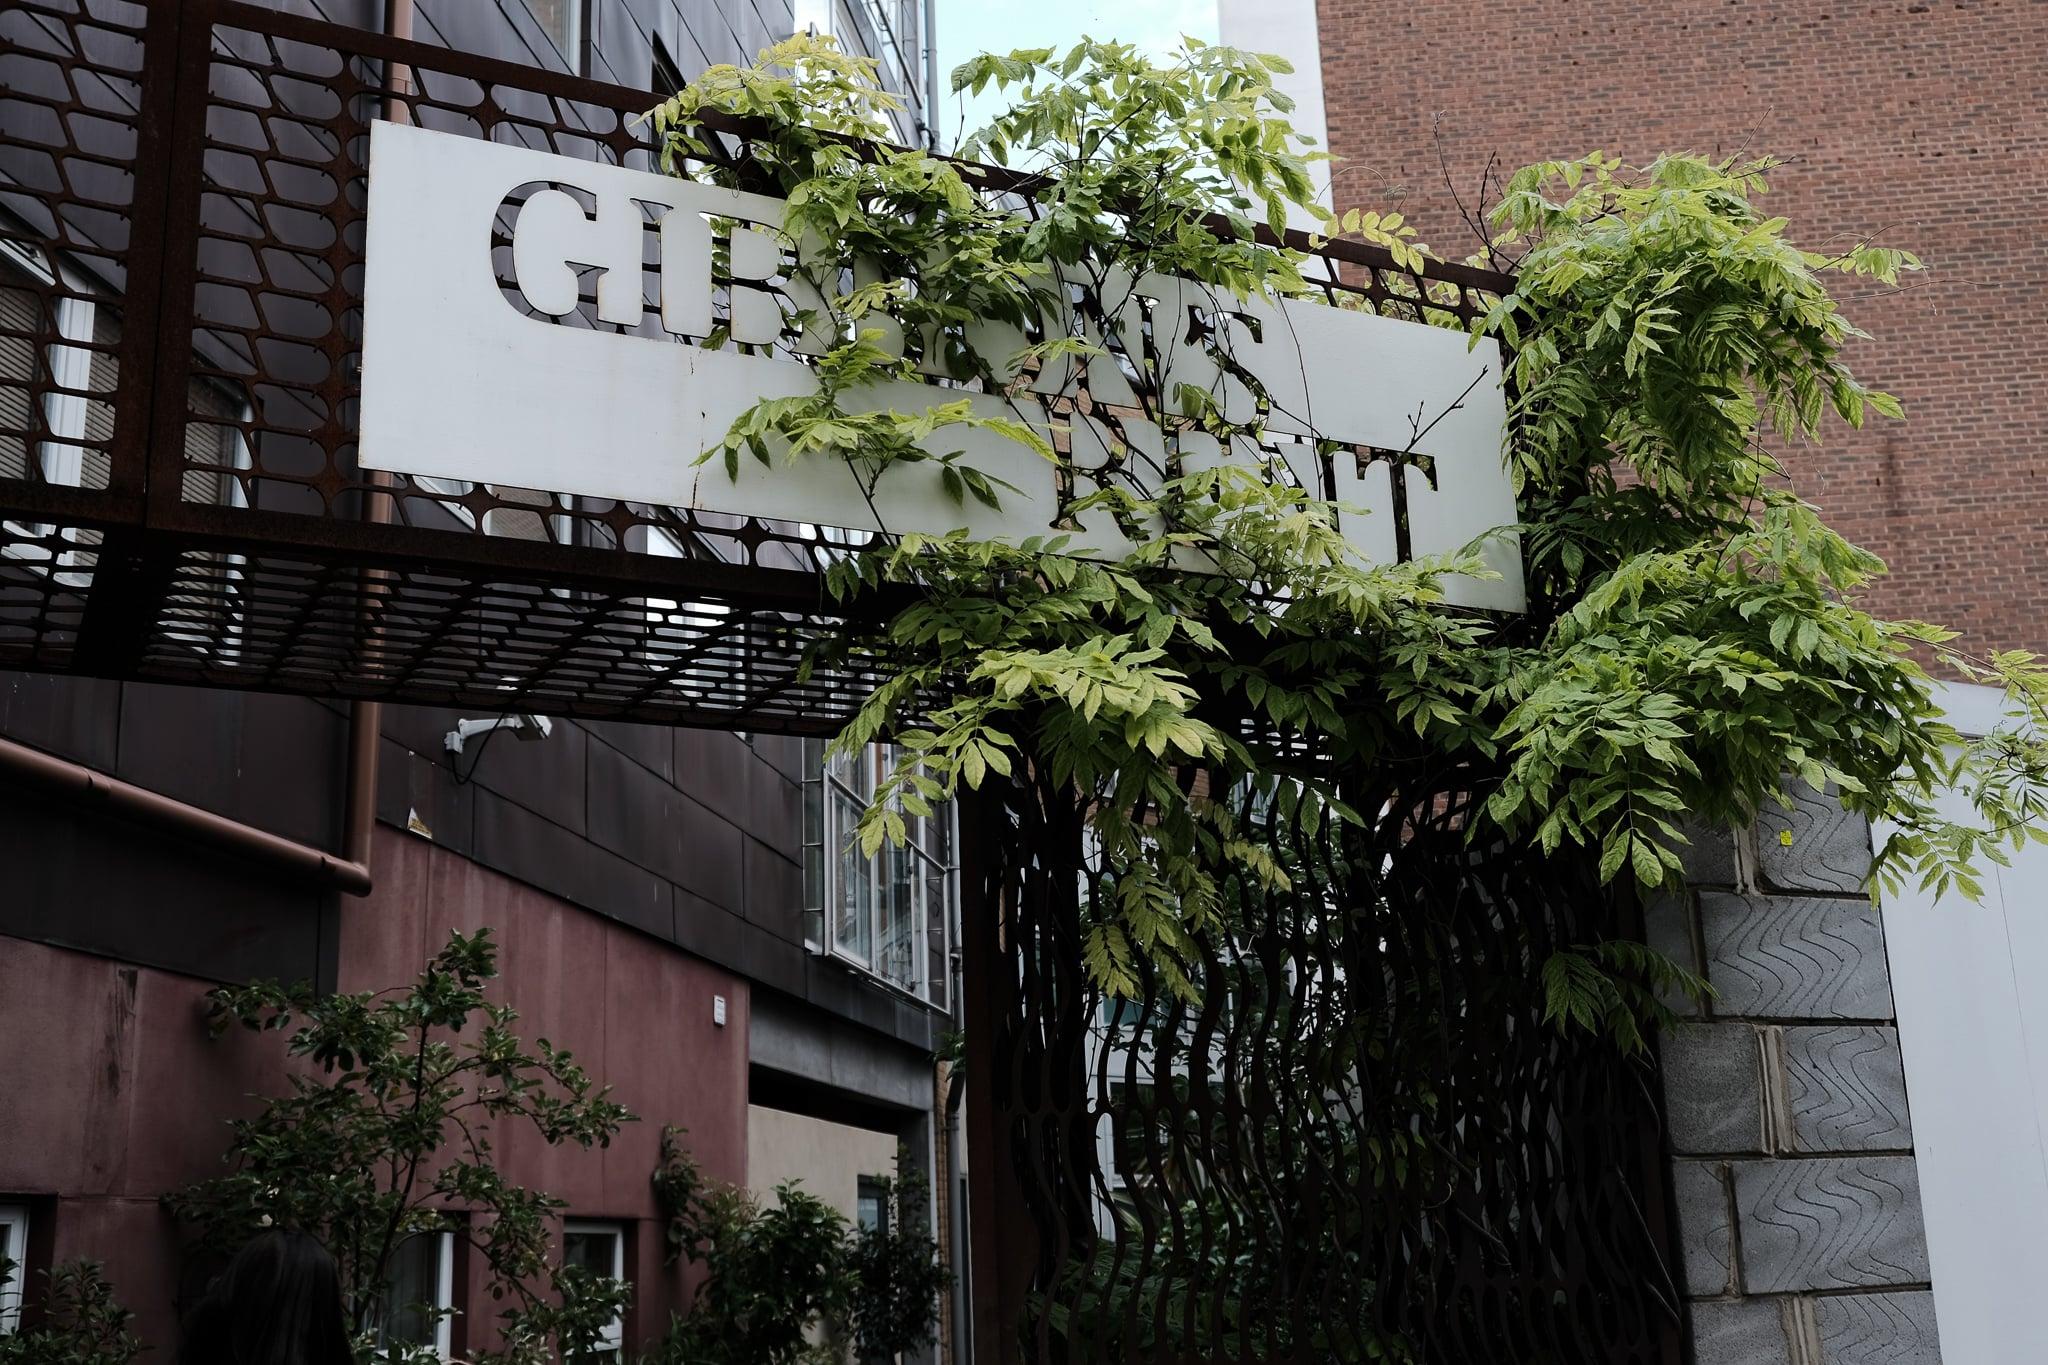 Gibbon's Rent